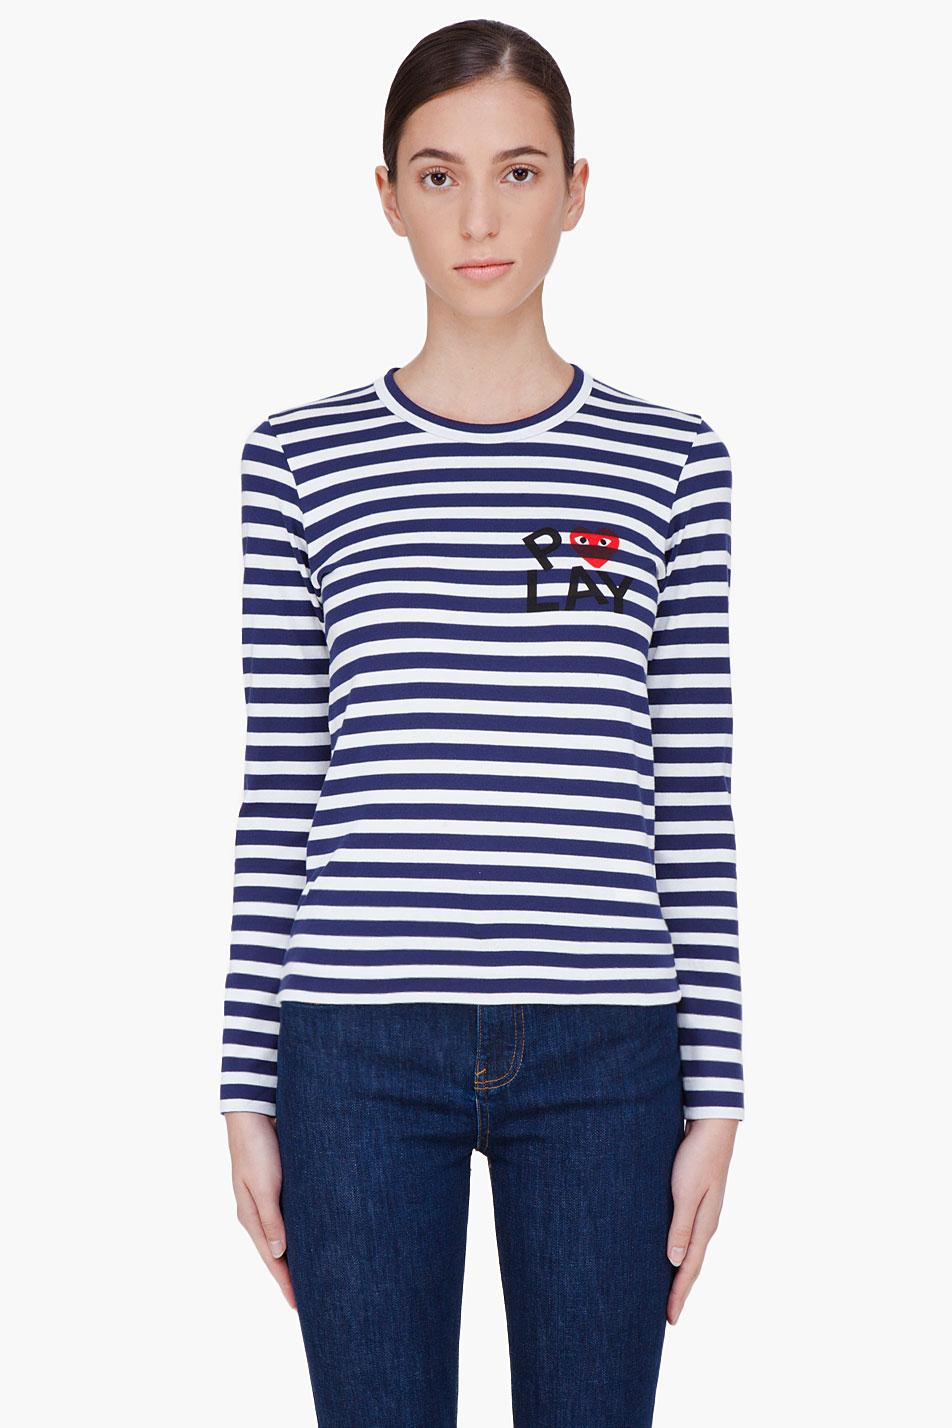 comme des garons play navy striped emblem t_shirt